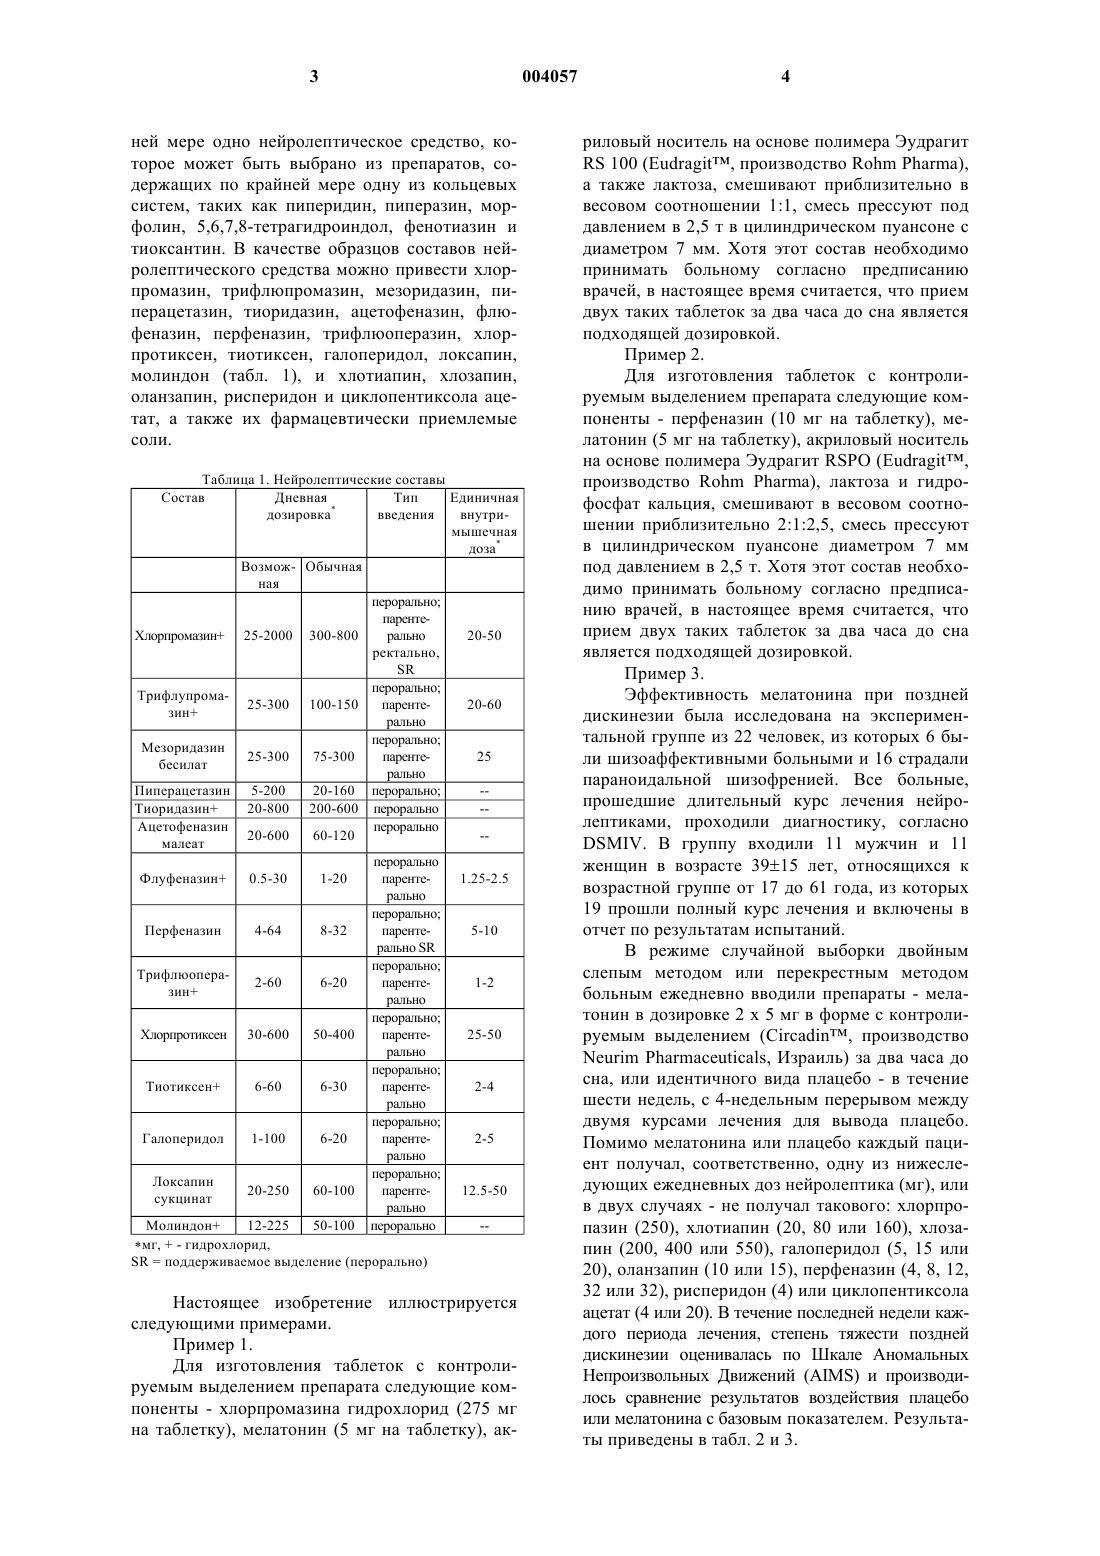 Трифлюоперазин